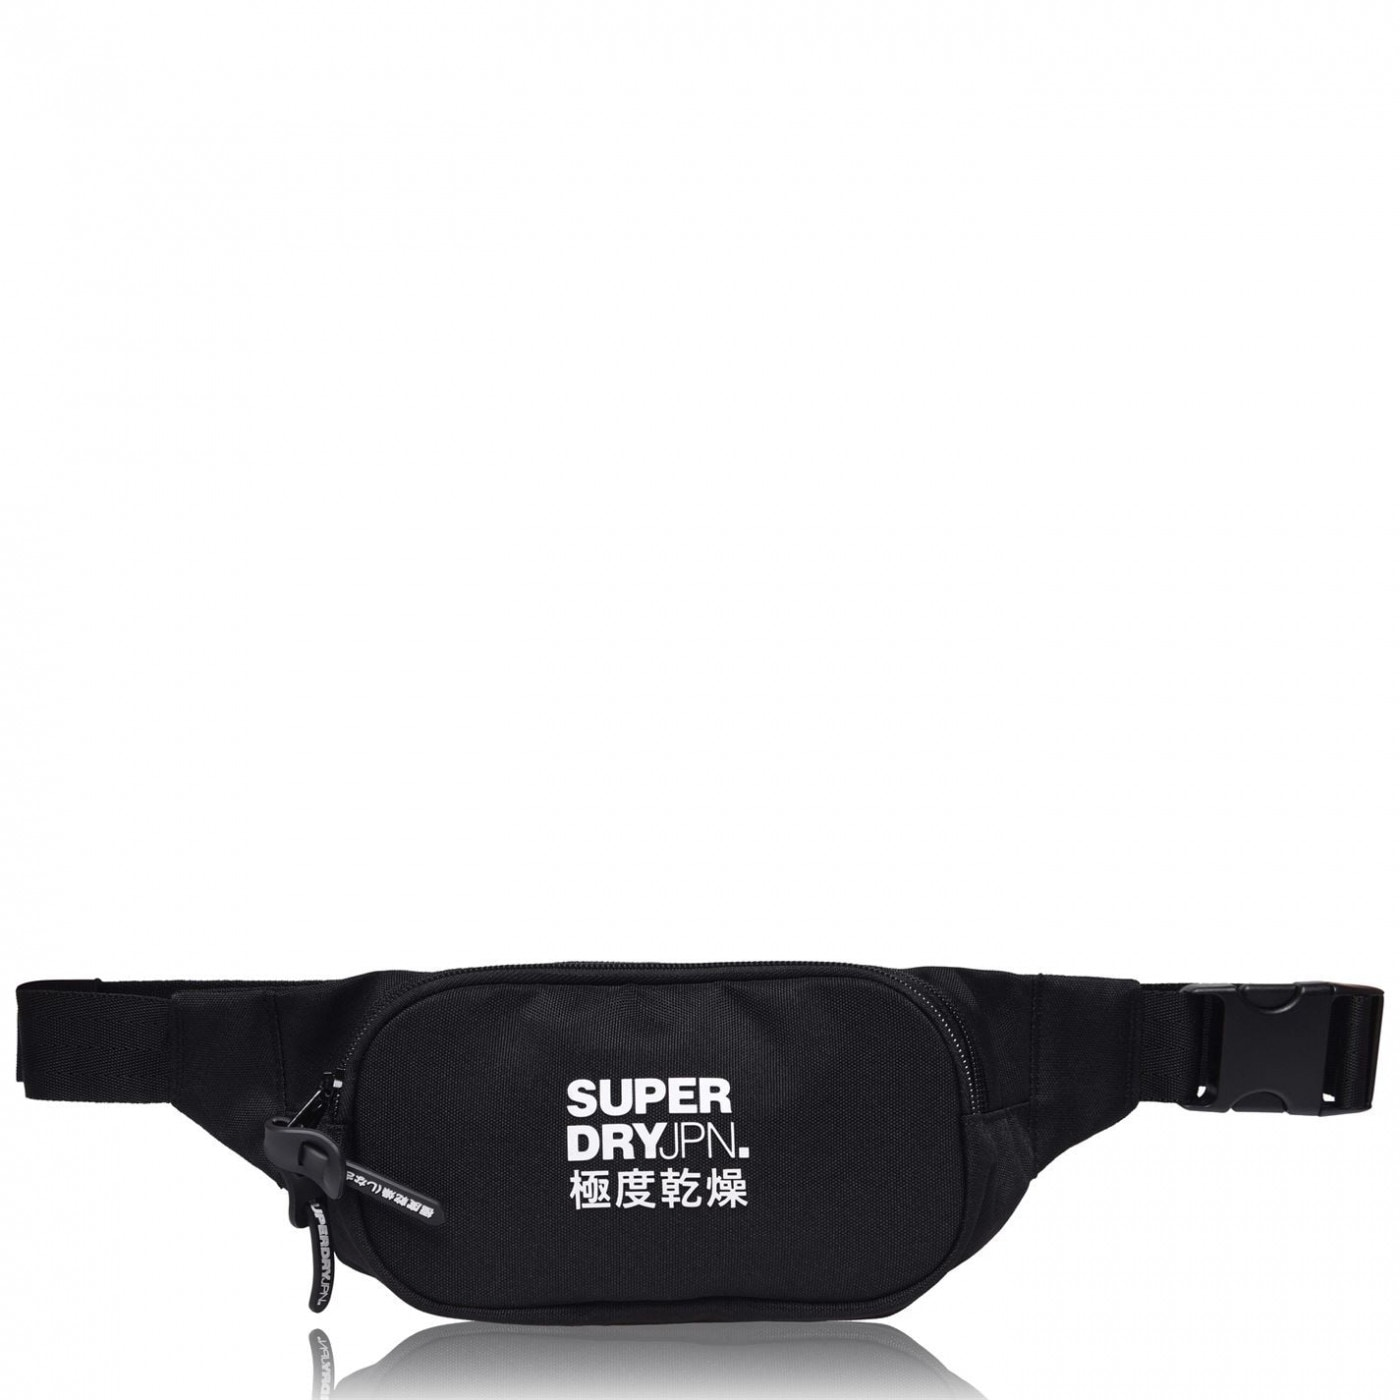 Superdry Small Bum Bag